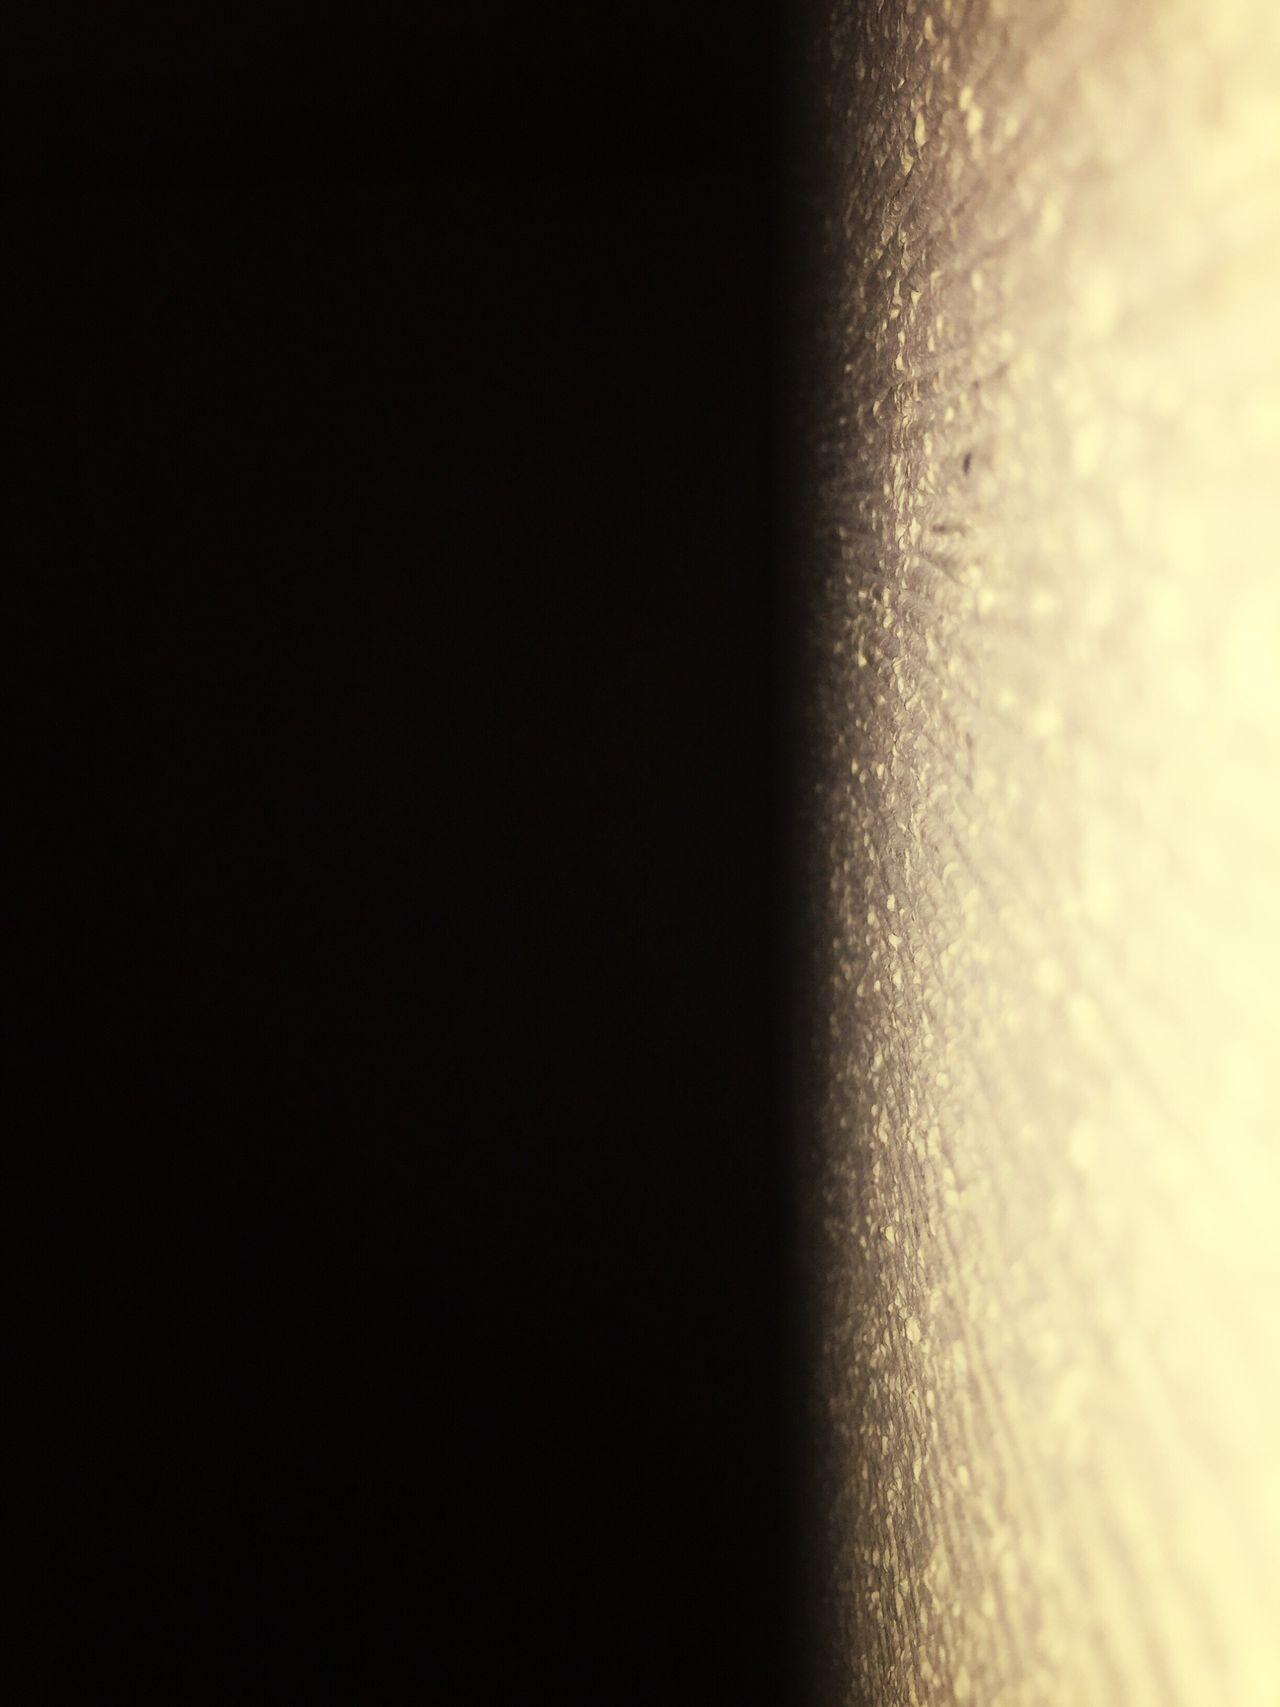 EyeEm EyeEm Gallery EyeEm Best Shots EyeEmBestPics Inside The Darkness Darkness Darkroom Darkness And Light Dark Photography Wall Night Photography Nightphotography Night Lights Night View Nightlife CreativePhotographer